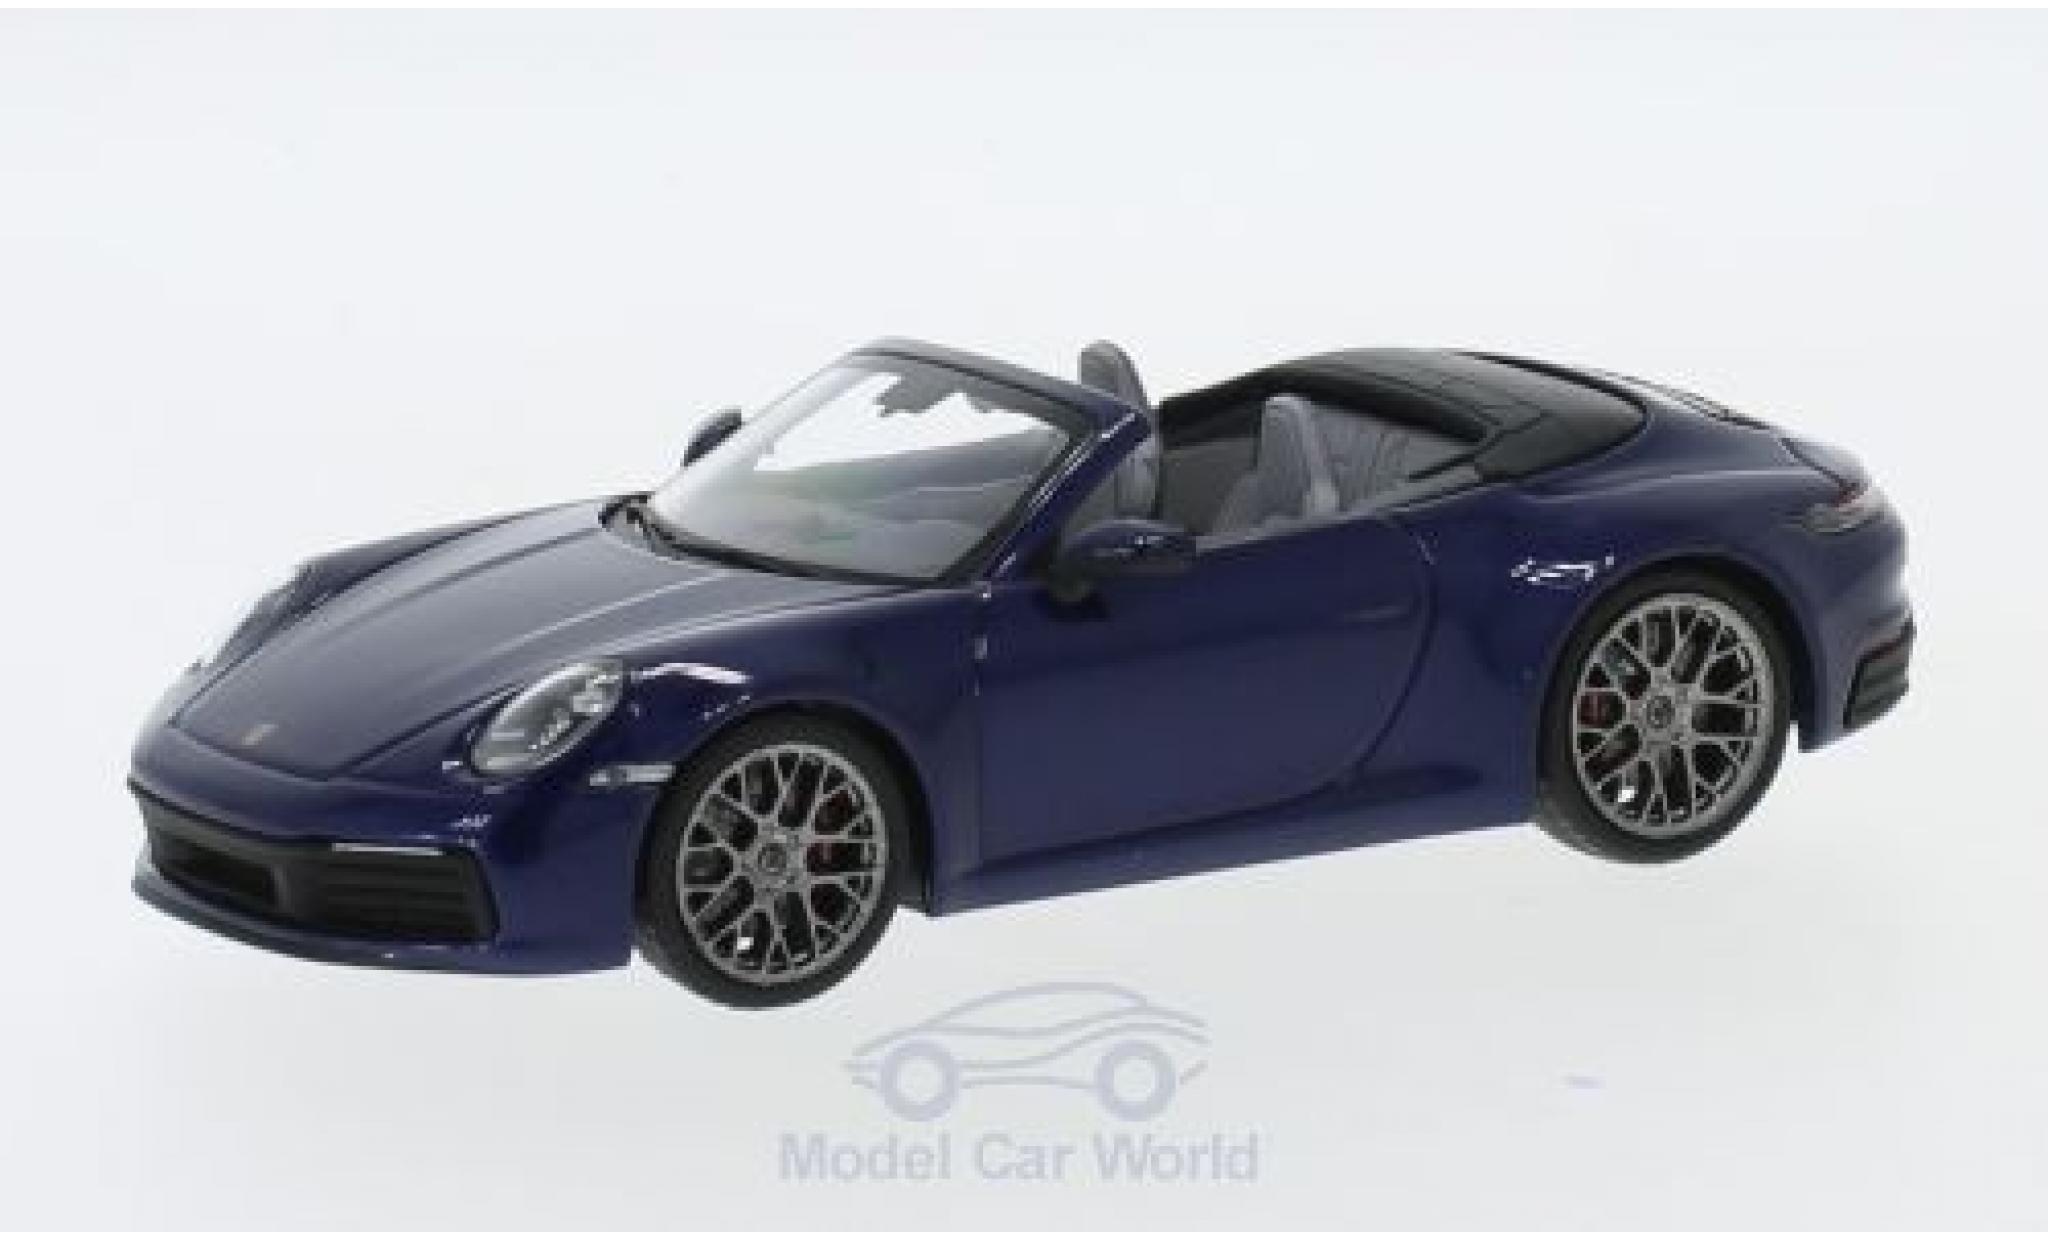 Porsche 911 1/43 I Minichamps (992) Carrera 4S Cabriolet metalico azul 2019